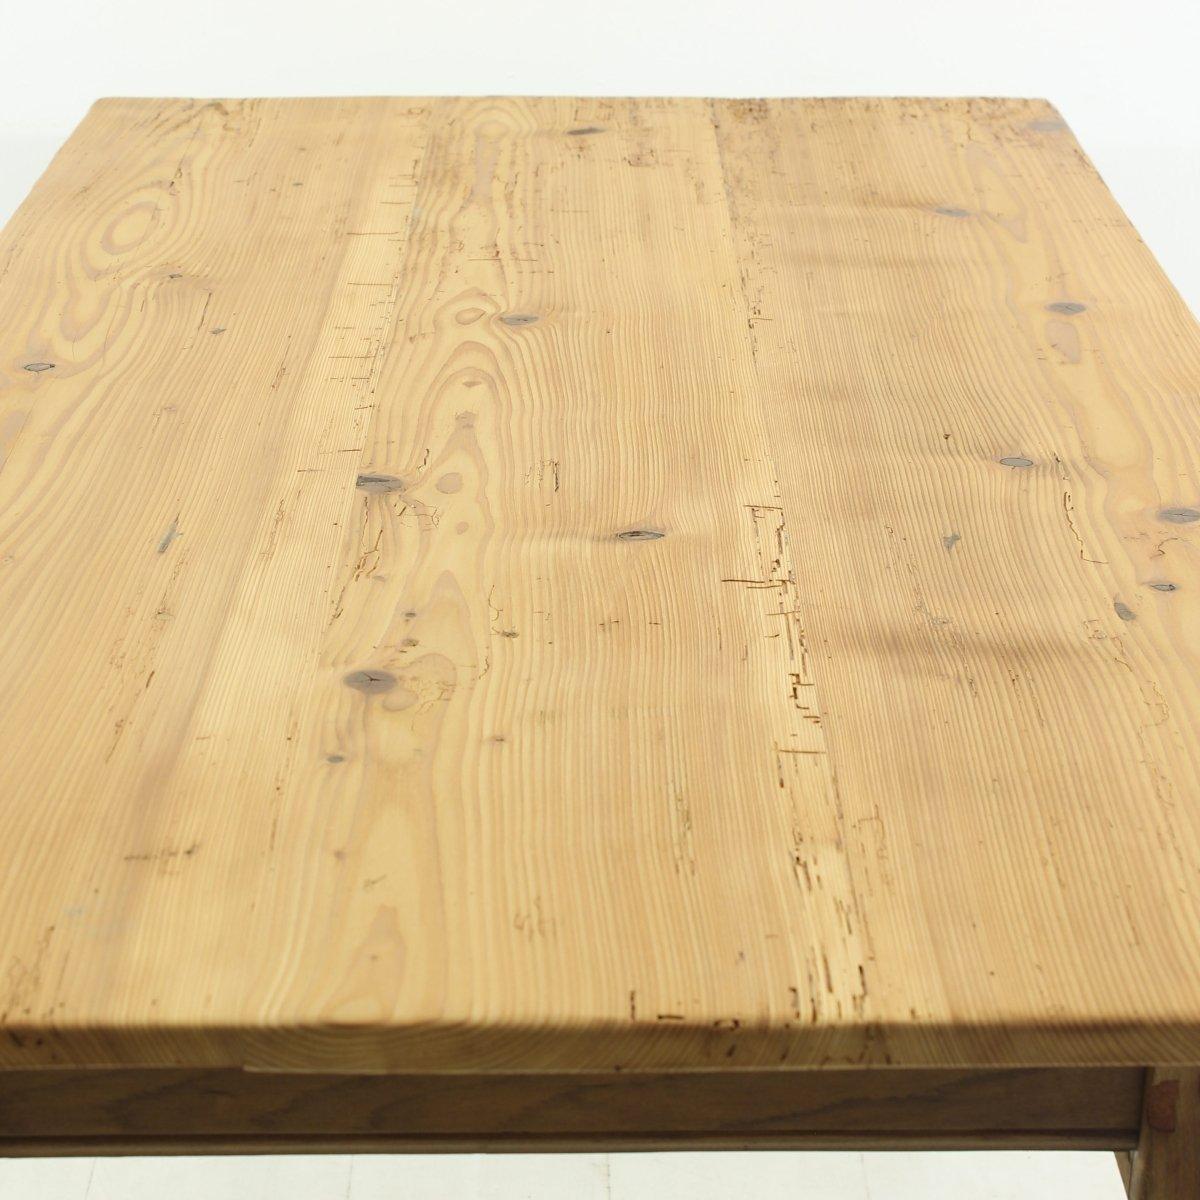 Antique Dining Table 1890s 4 1 483 00 Price Per Piece